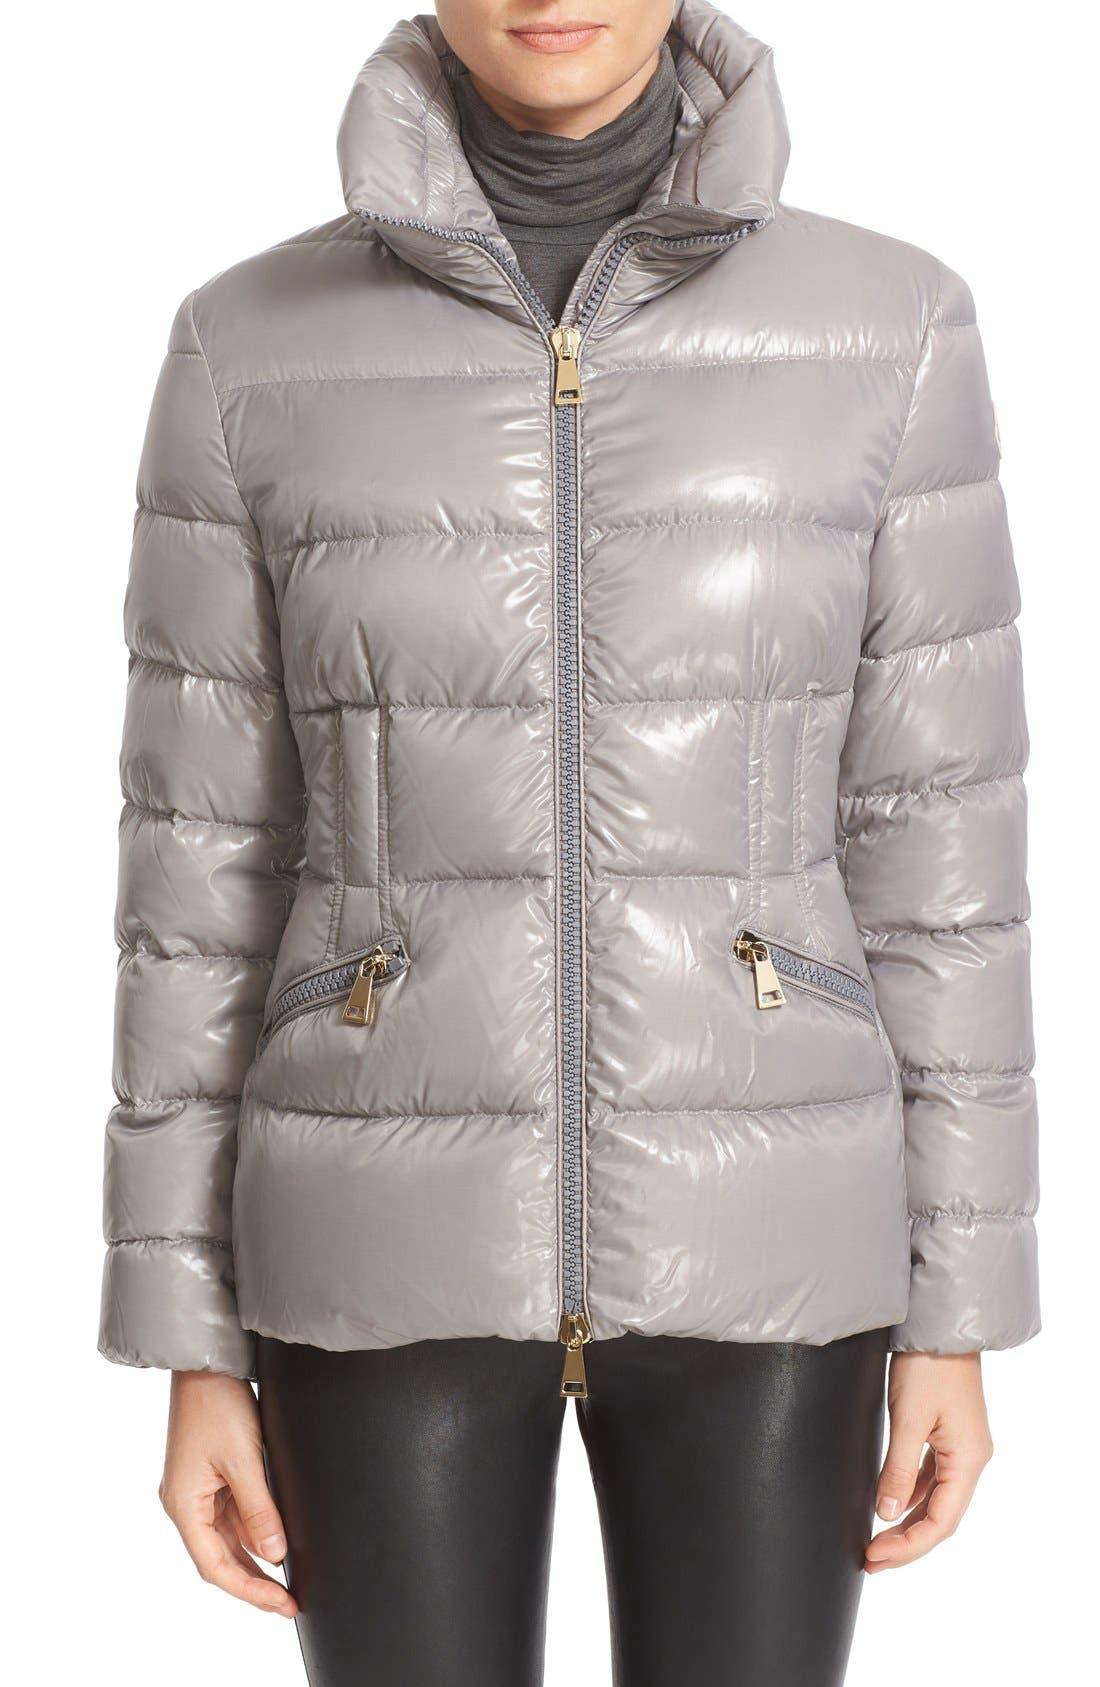 Alternate Image 1 Selected - Moncler 'Daphne' Water Resistant Short Shiny Nylon Jacket